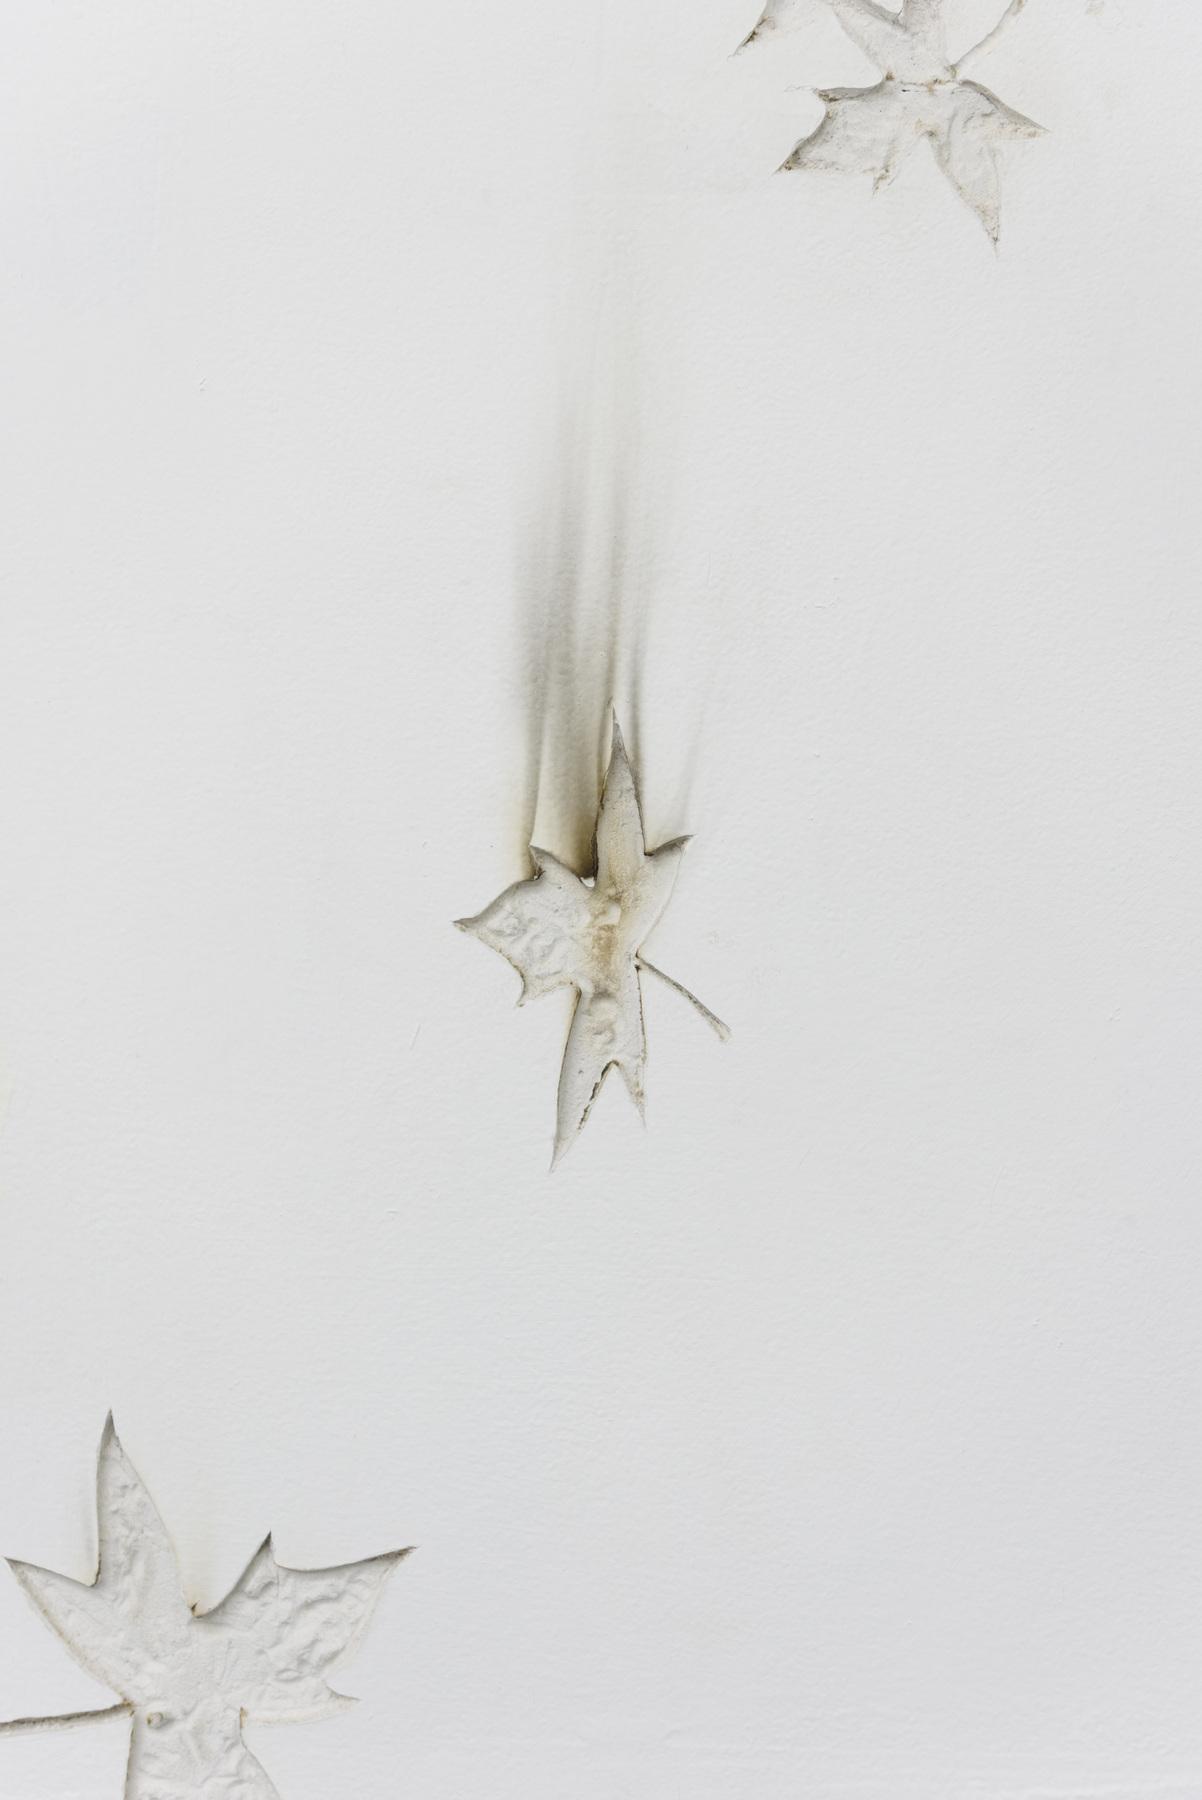 Michael Assiff-Ozone Flowers 14